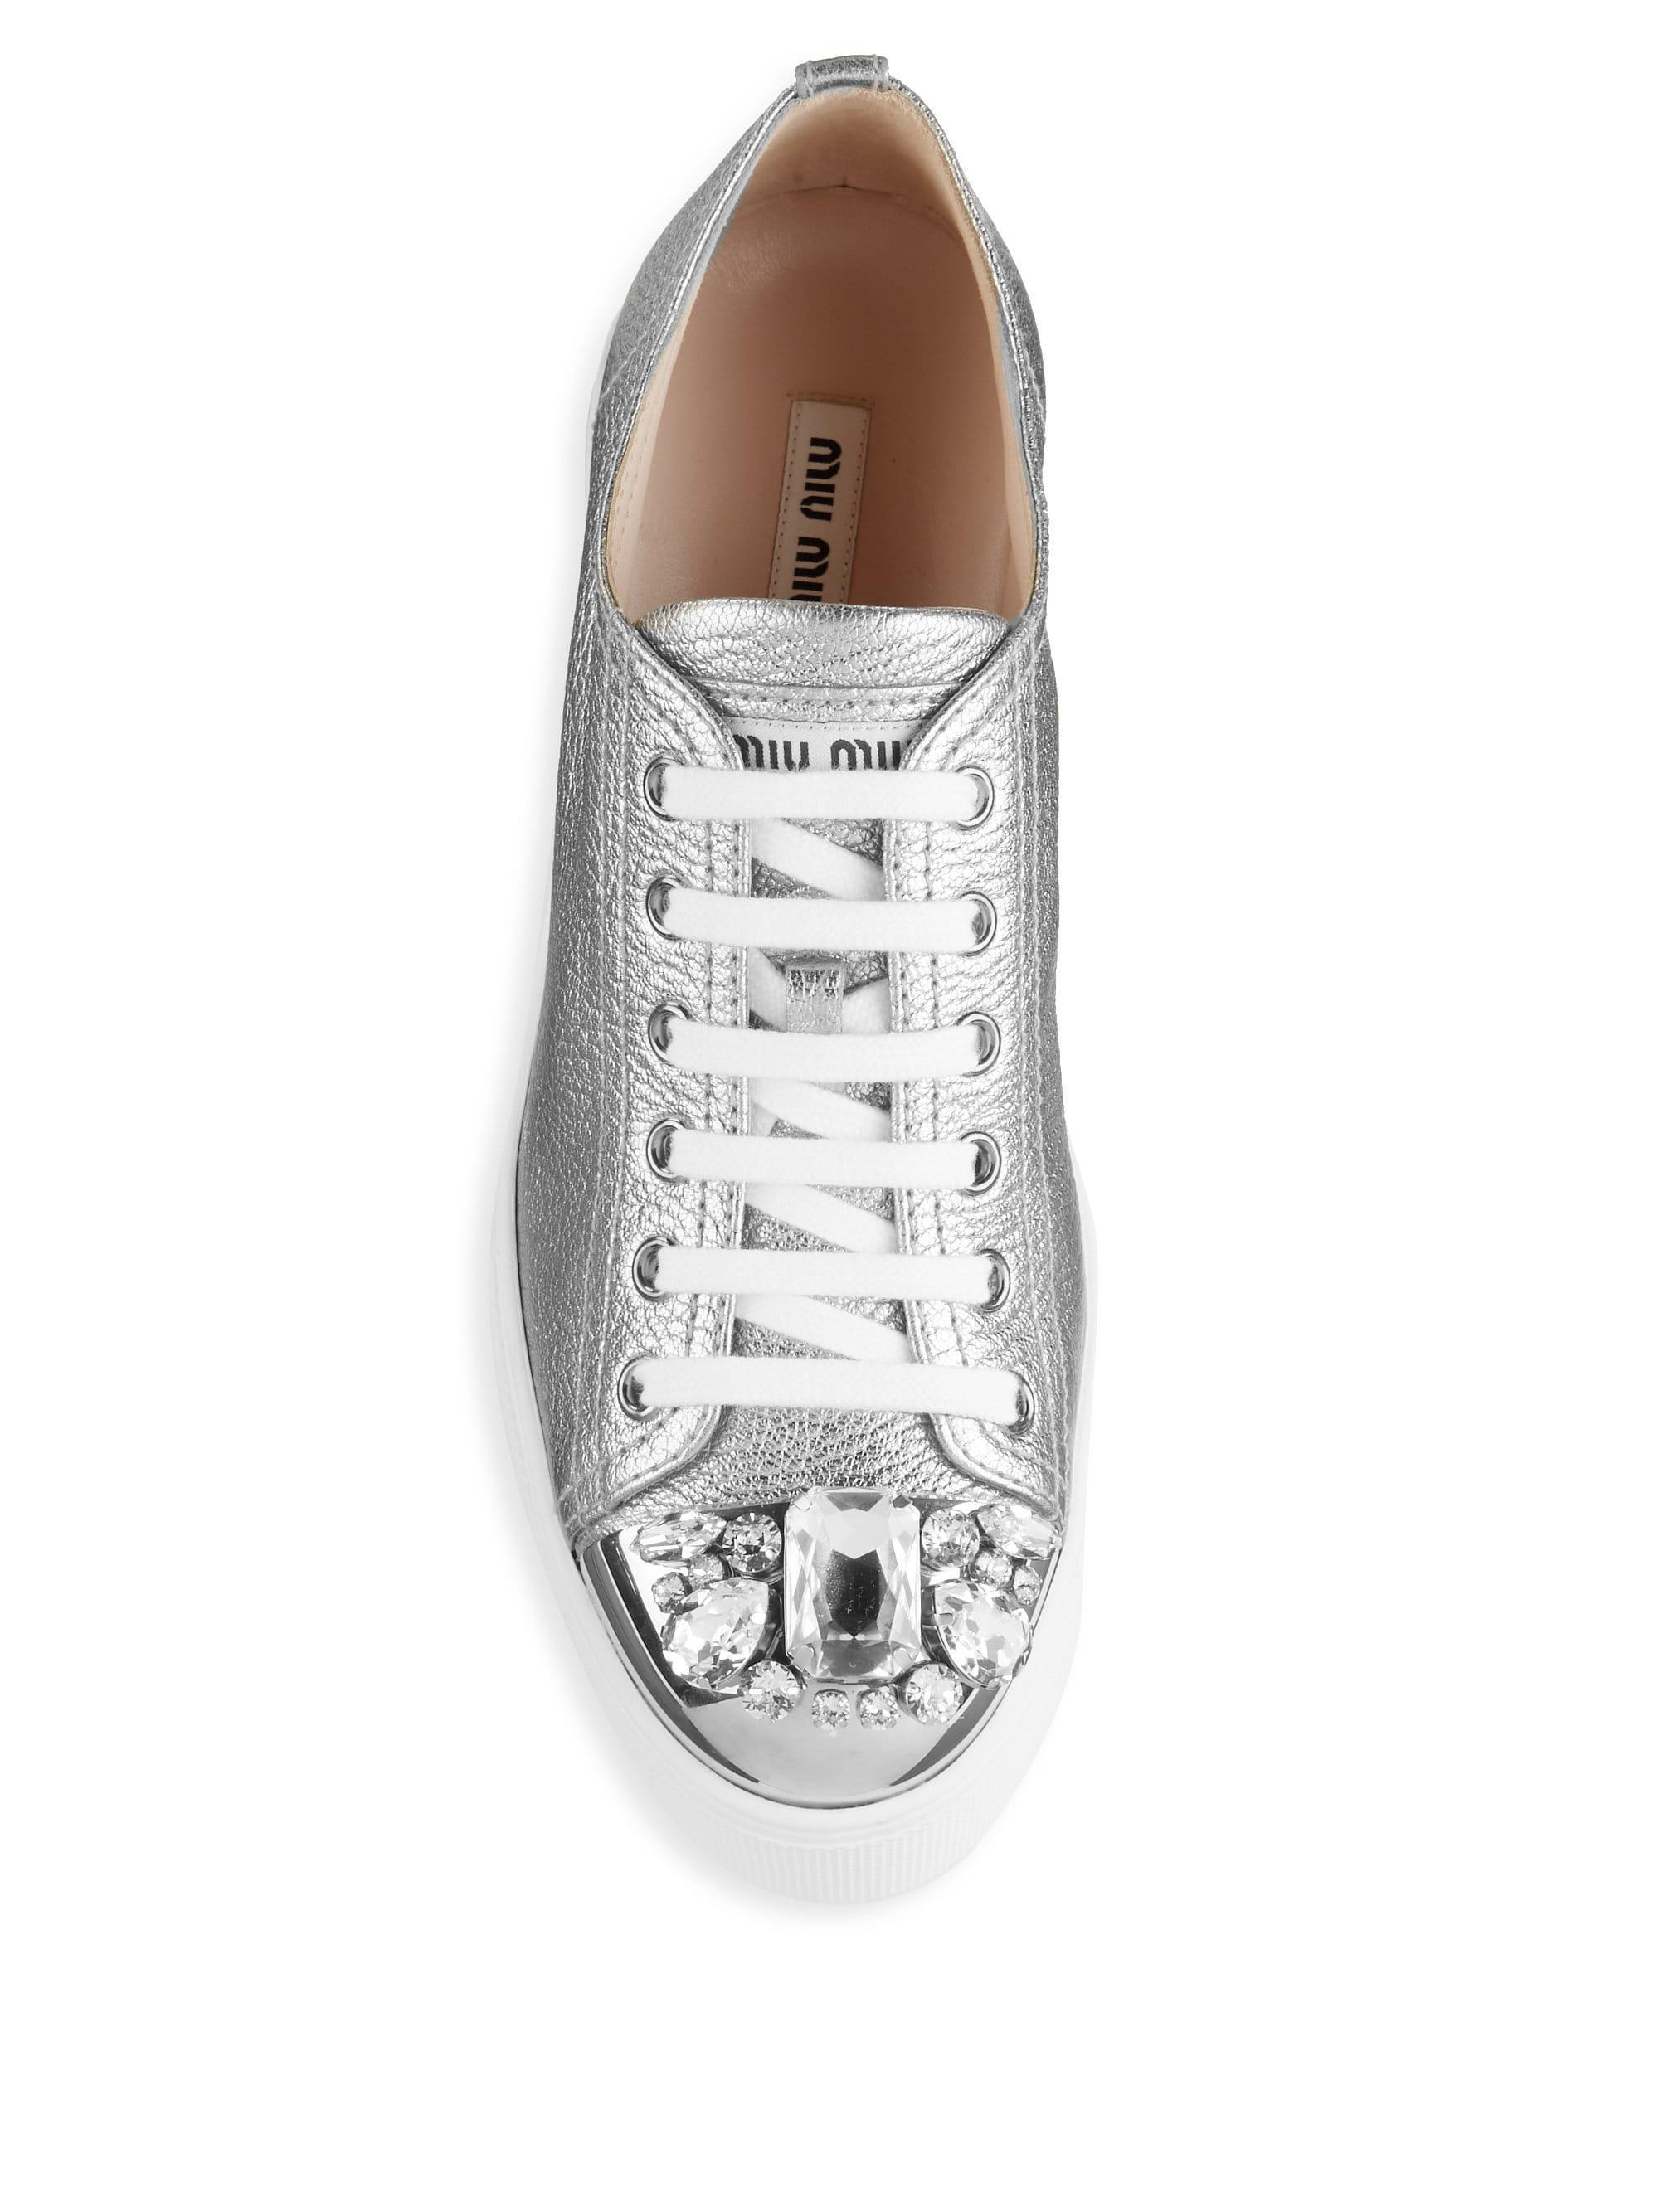 eb0081ef3c9 Miu Miu Embellished Leather Cap Toe Platform Wedge Sneakers - Lyst